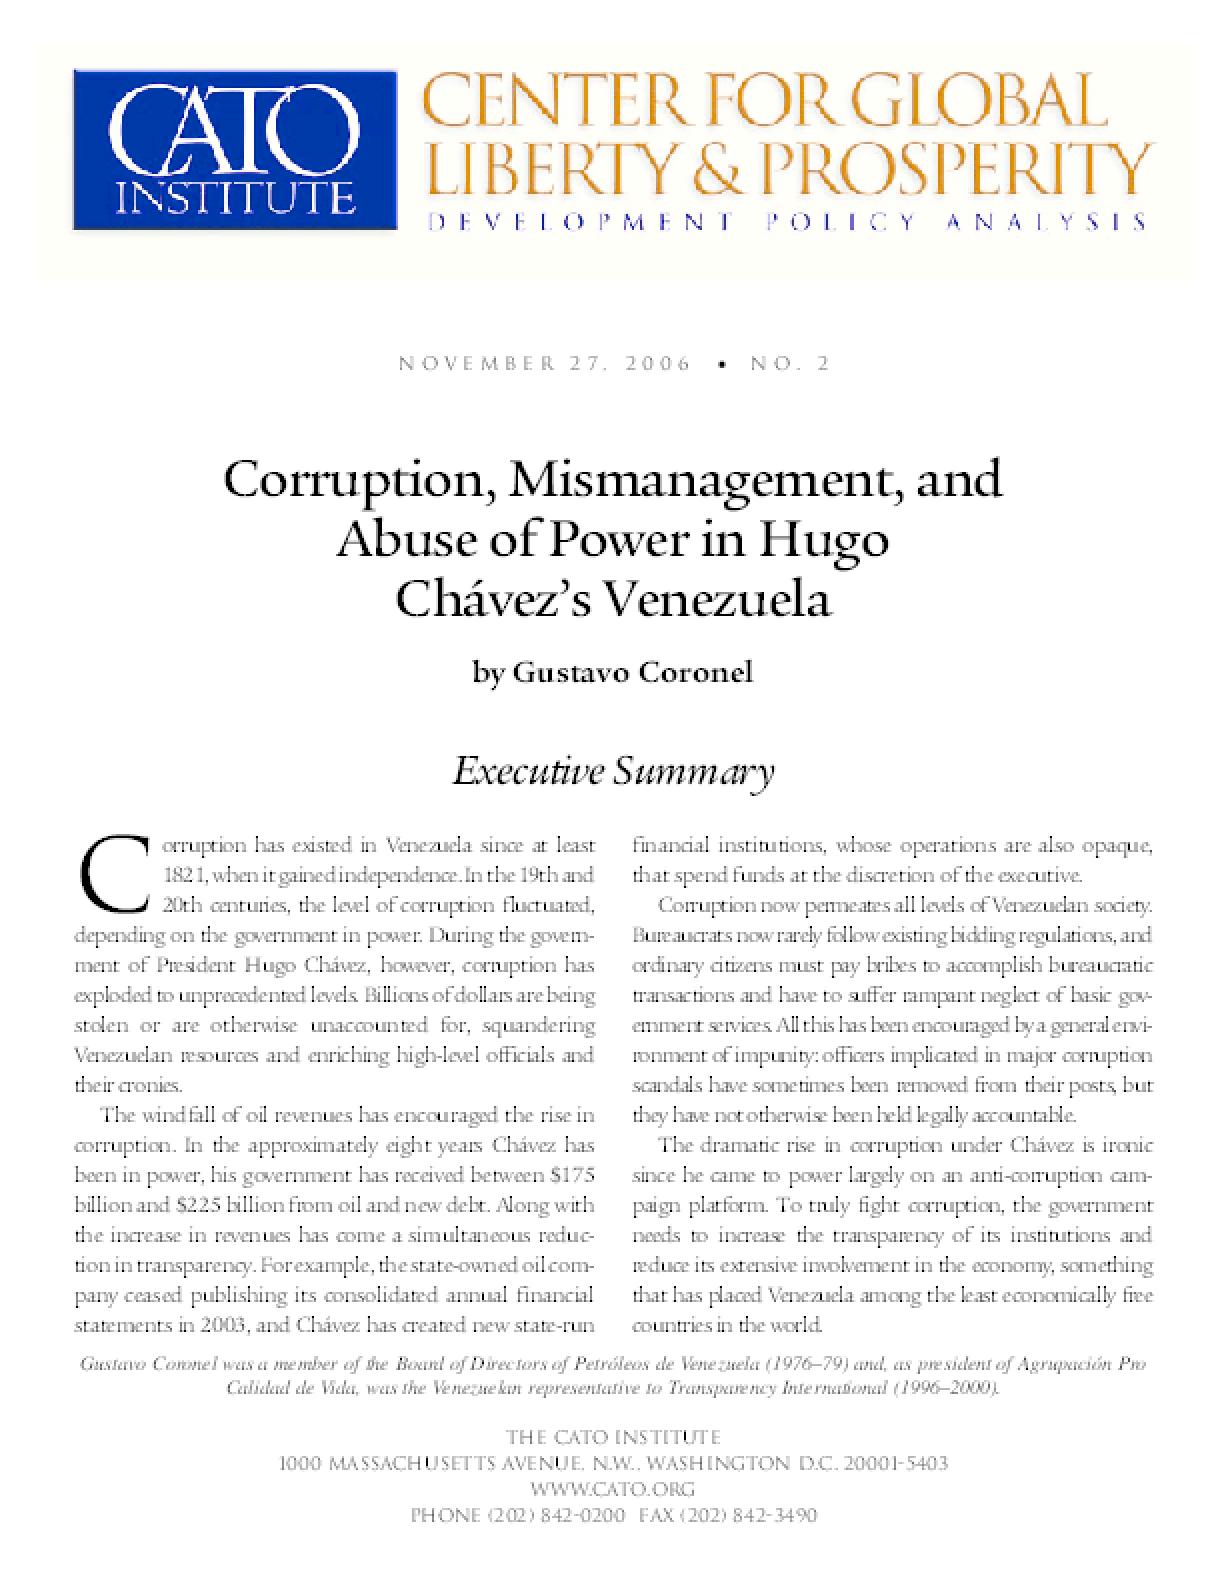 Corruption, Mismanagement, and Abuse of Power in Hugo Chavez's Venezuela